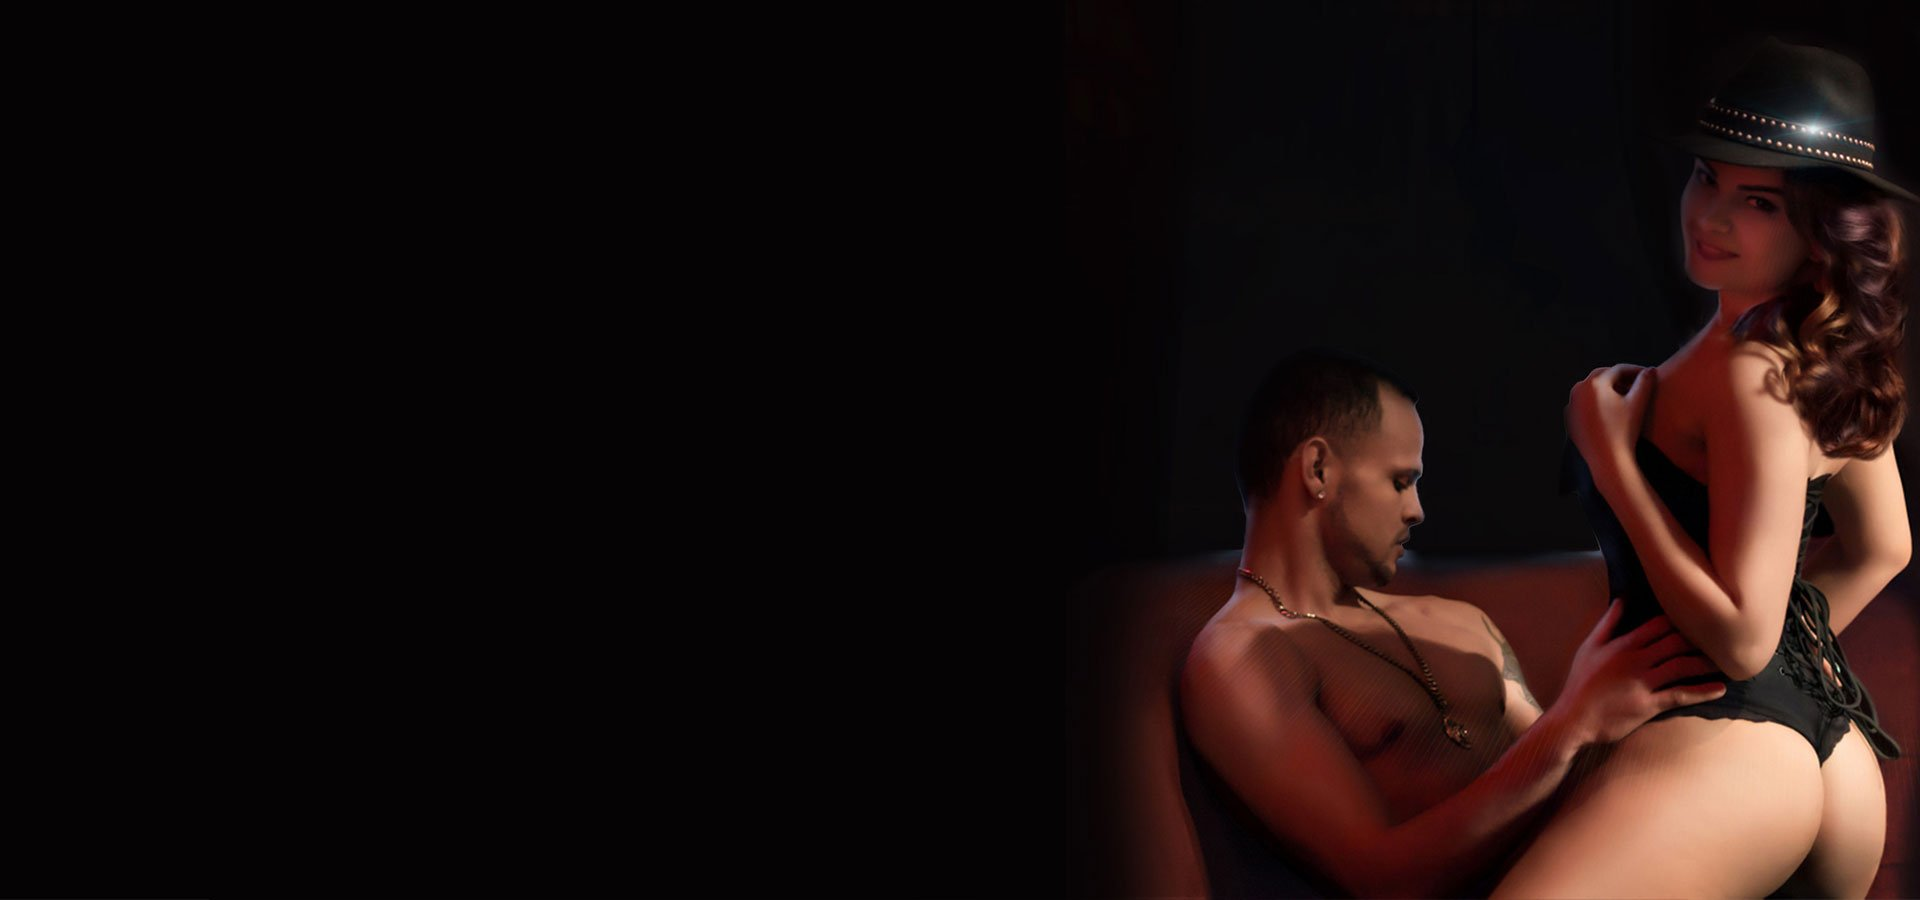 Actor Porno En Tenerife 2017 erotischer tanz berlin - chez michelle. dein gentlemanclub